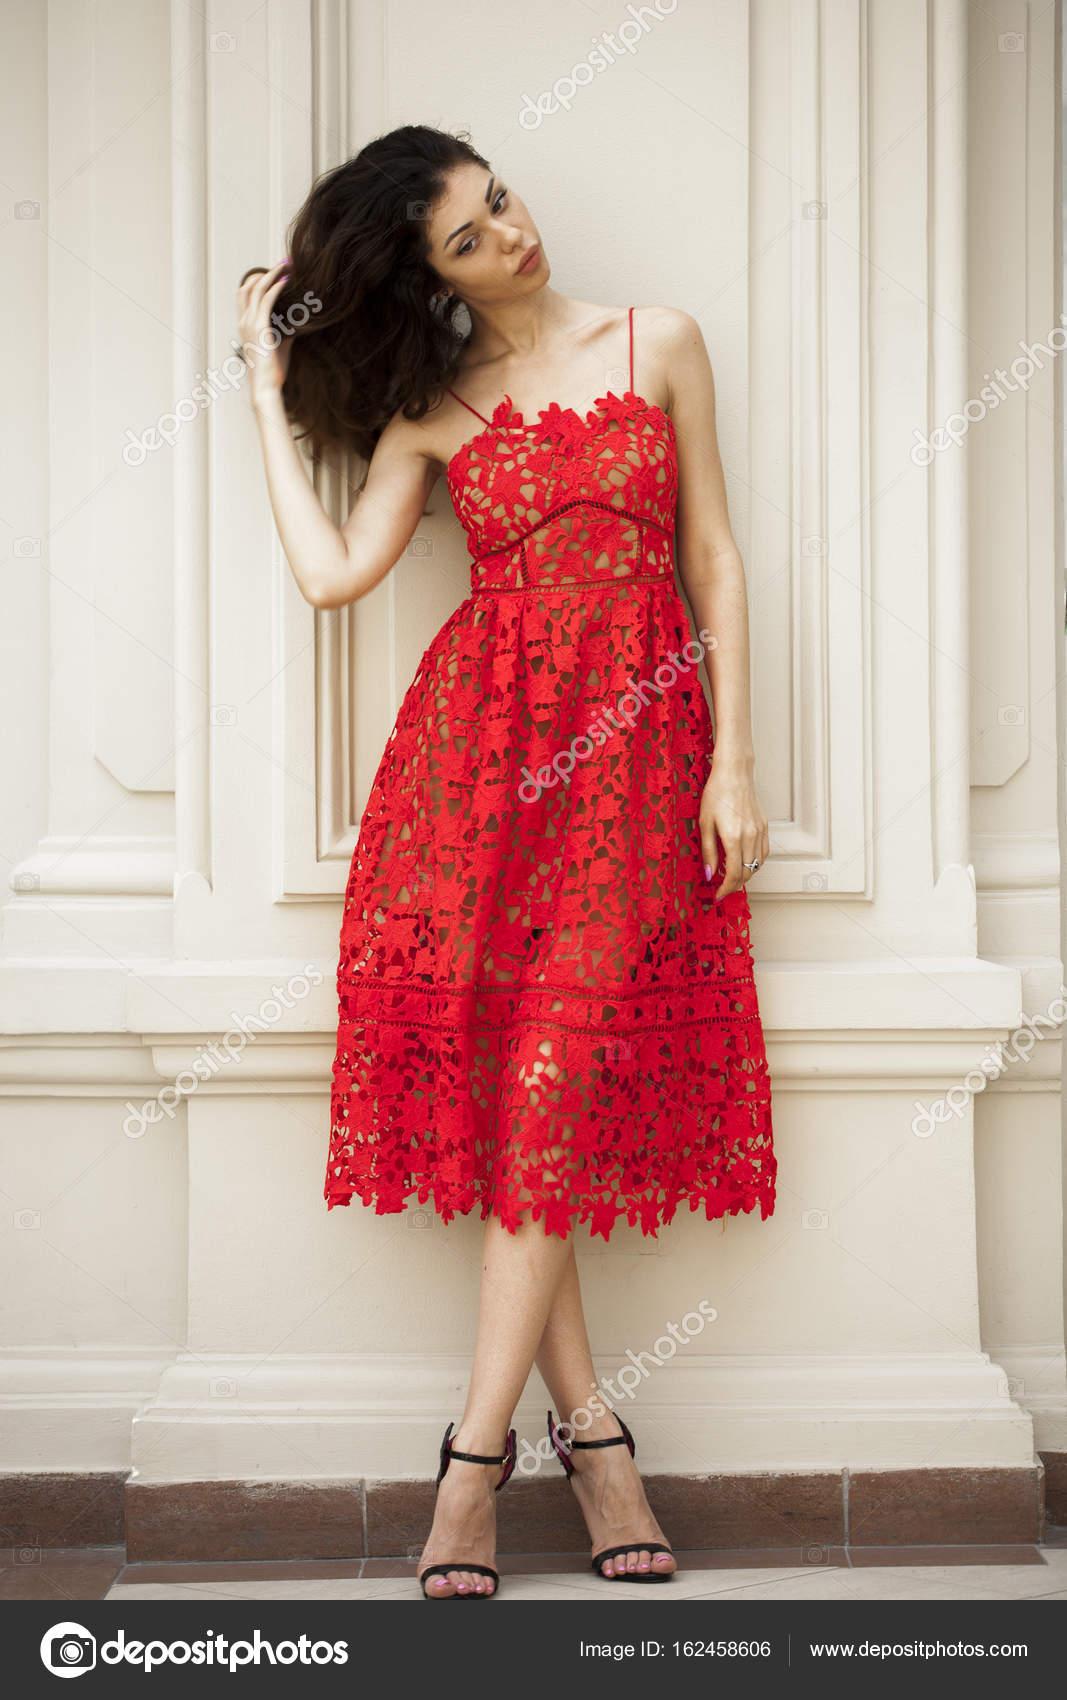 ee3b4358abc belle jeune femme en robe rouge sexy — Photographie arkusha ©  162458606